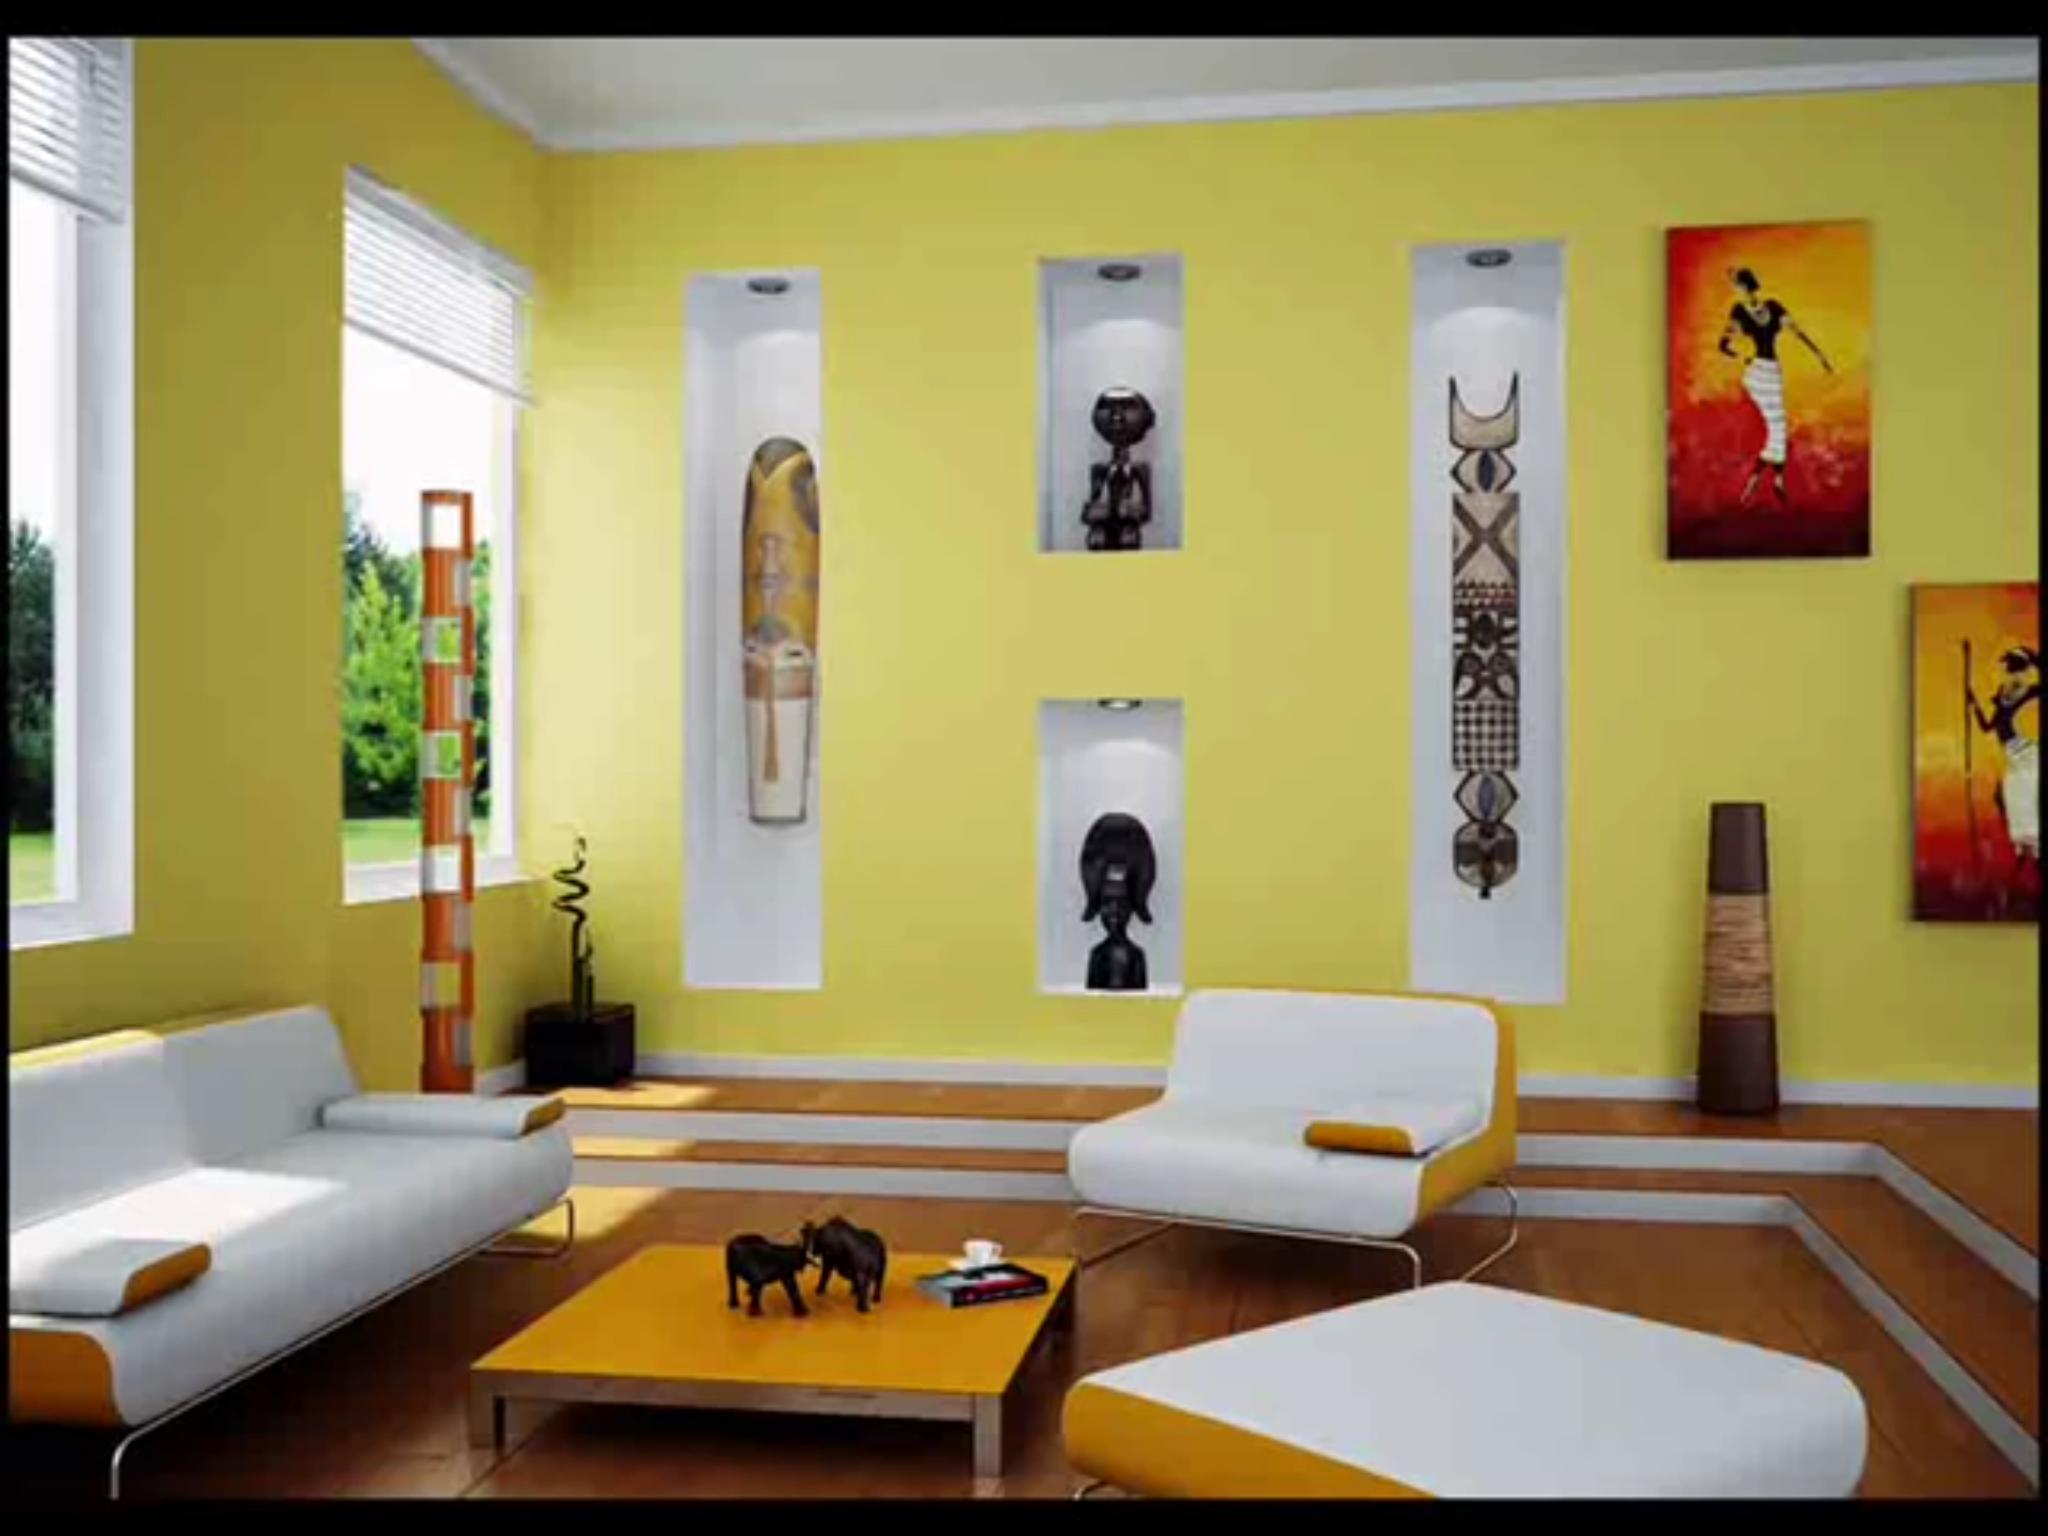 Pin by Arati Kumbhani on Arati\'s Home Designs 2017 | Pinterest